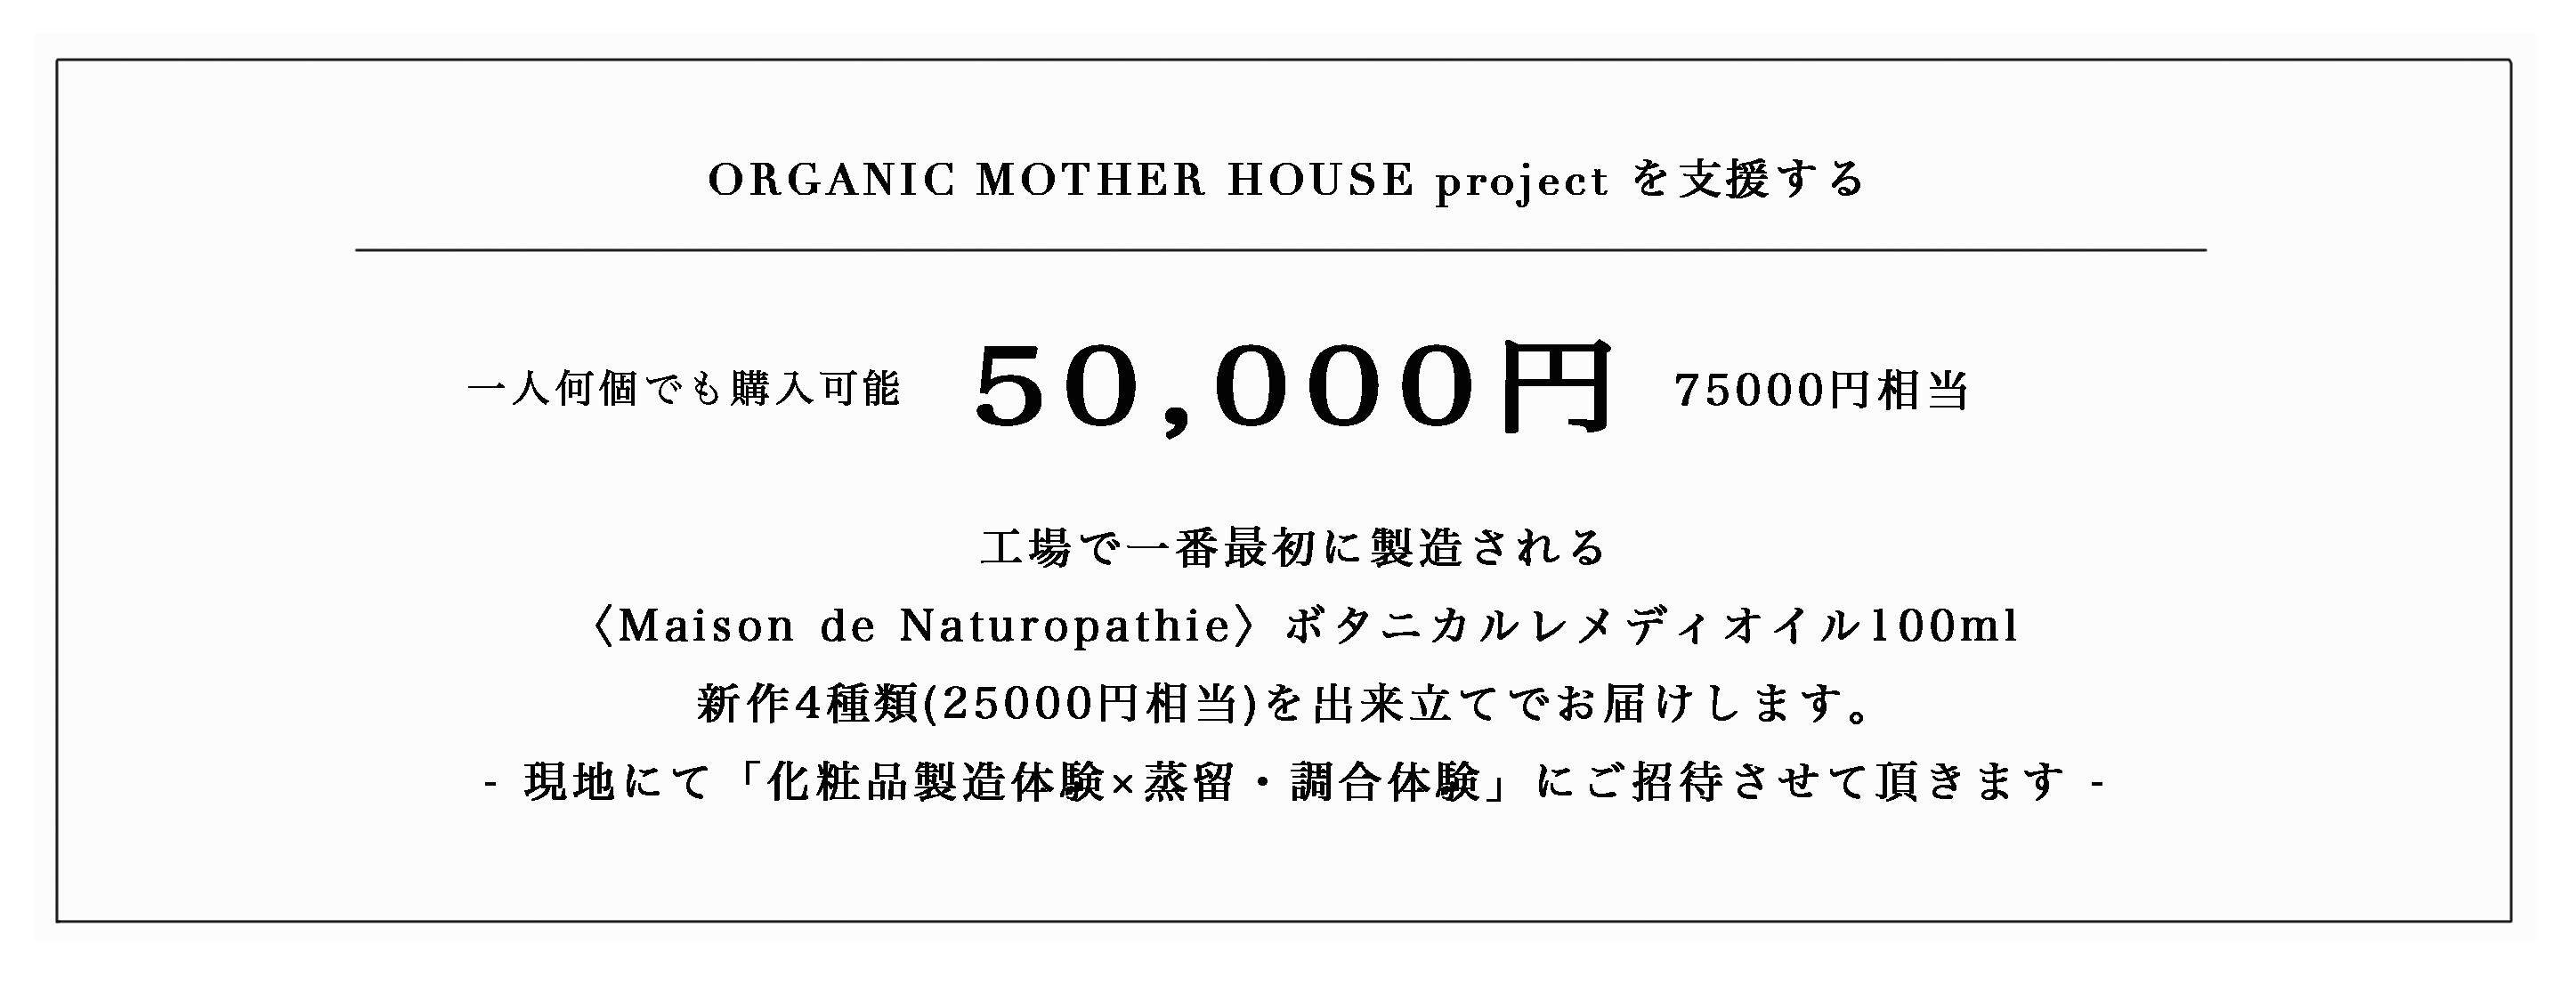 ORGANIC MOTHER HOUSE〈植物調合美容研究所〉5万